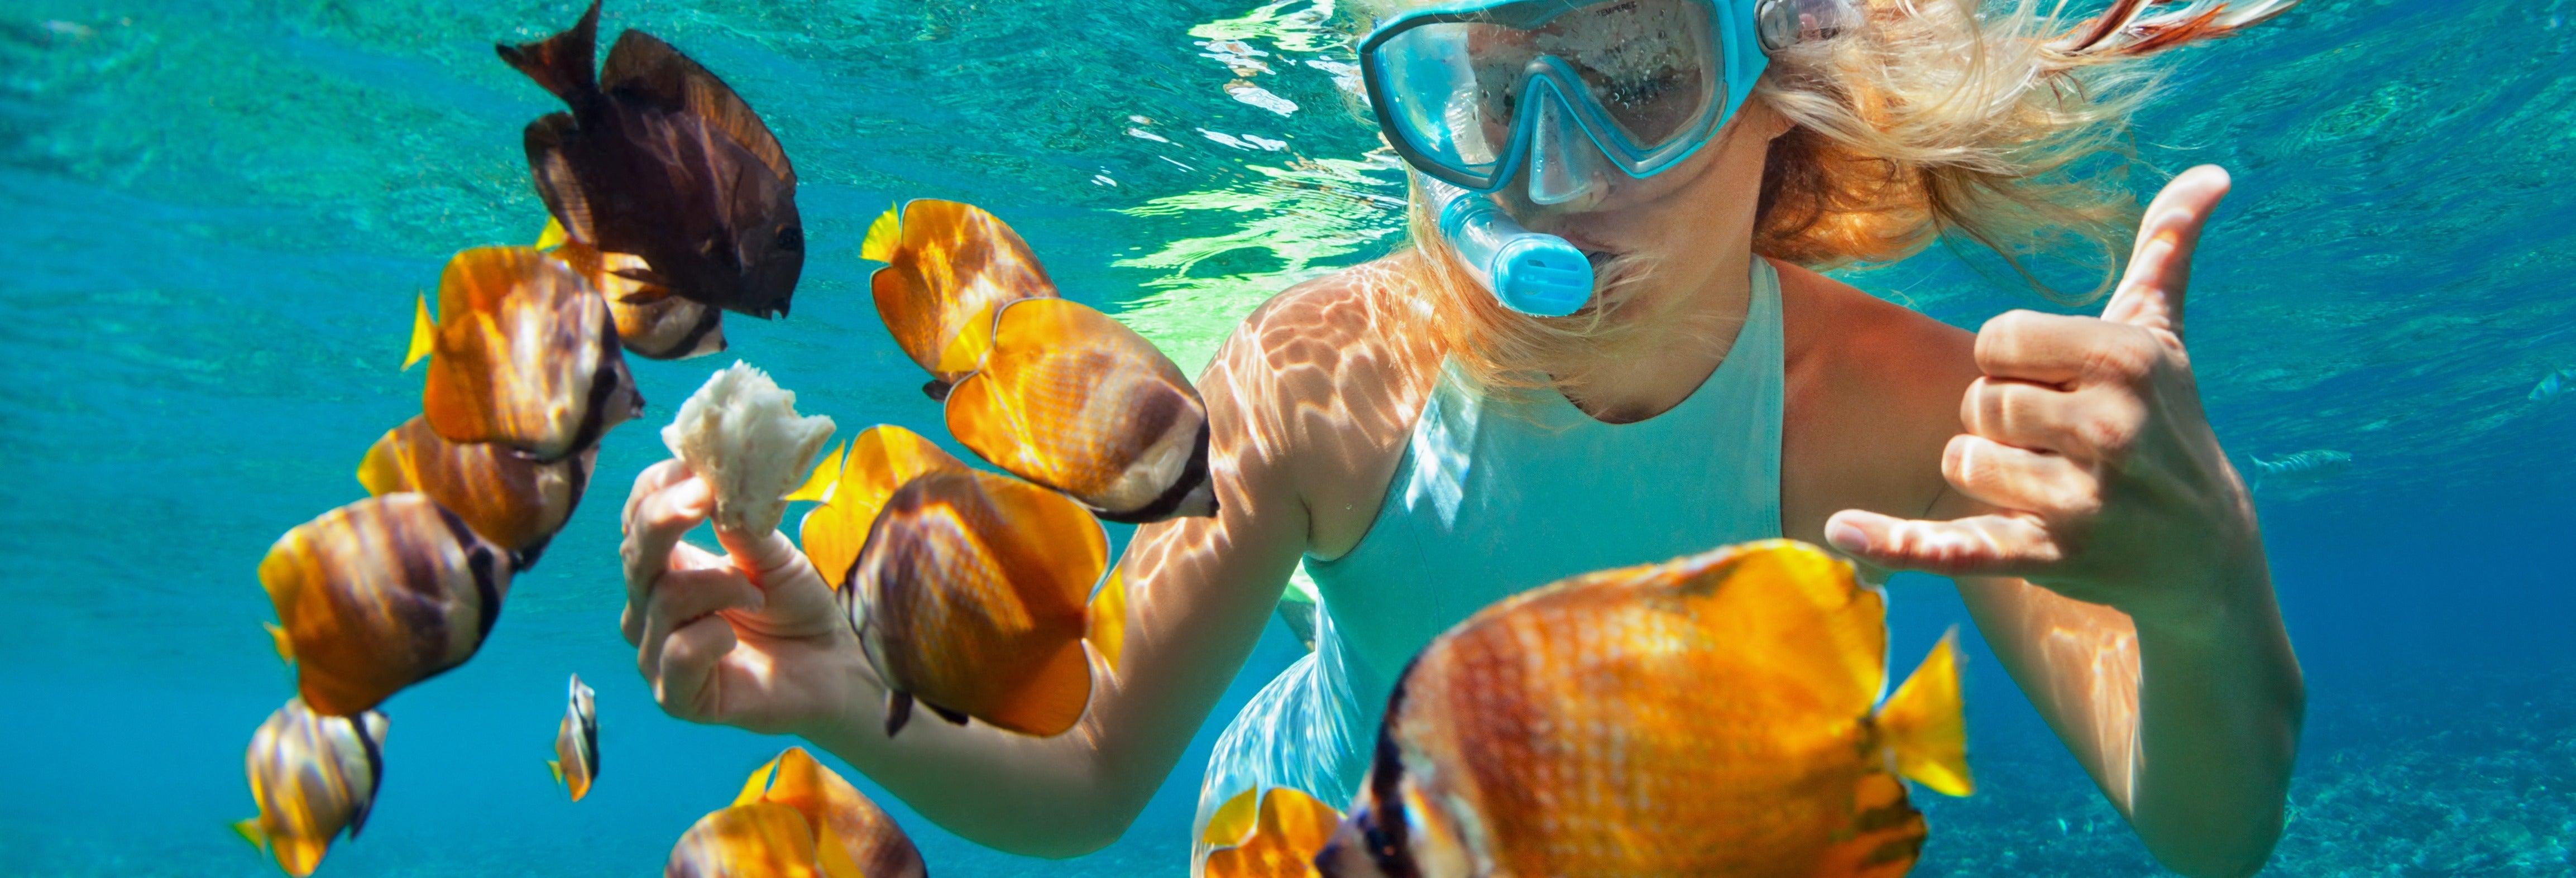 Snorkeling alla Pared di El Palmar